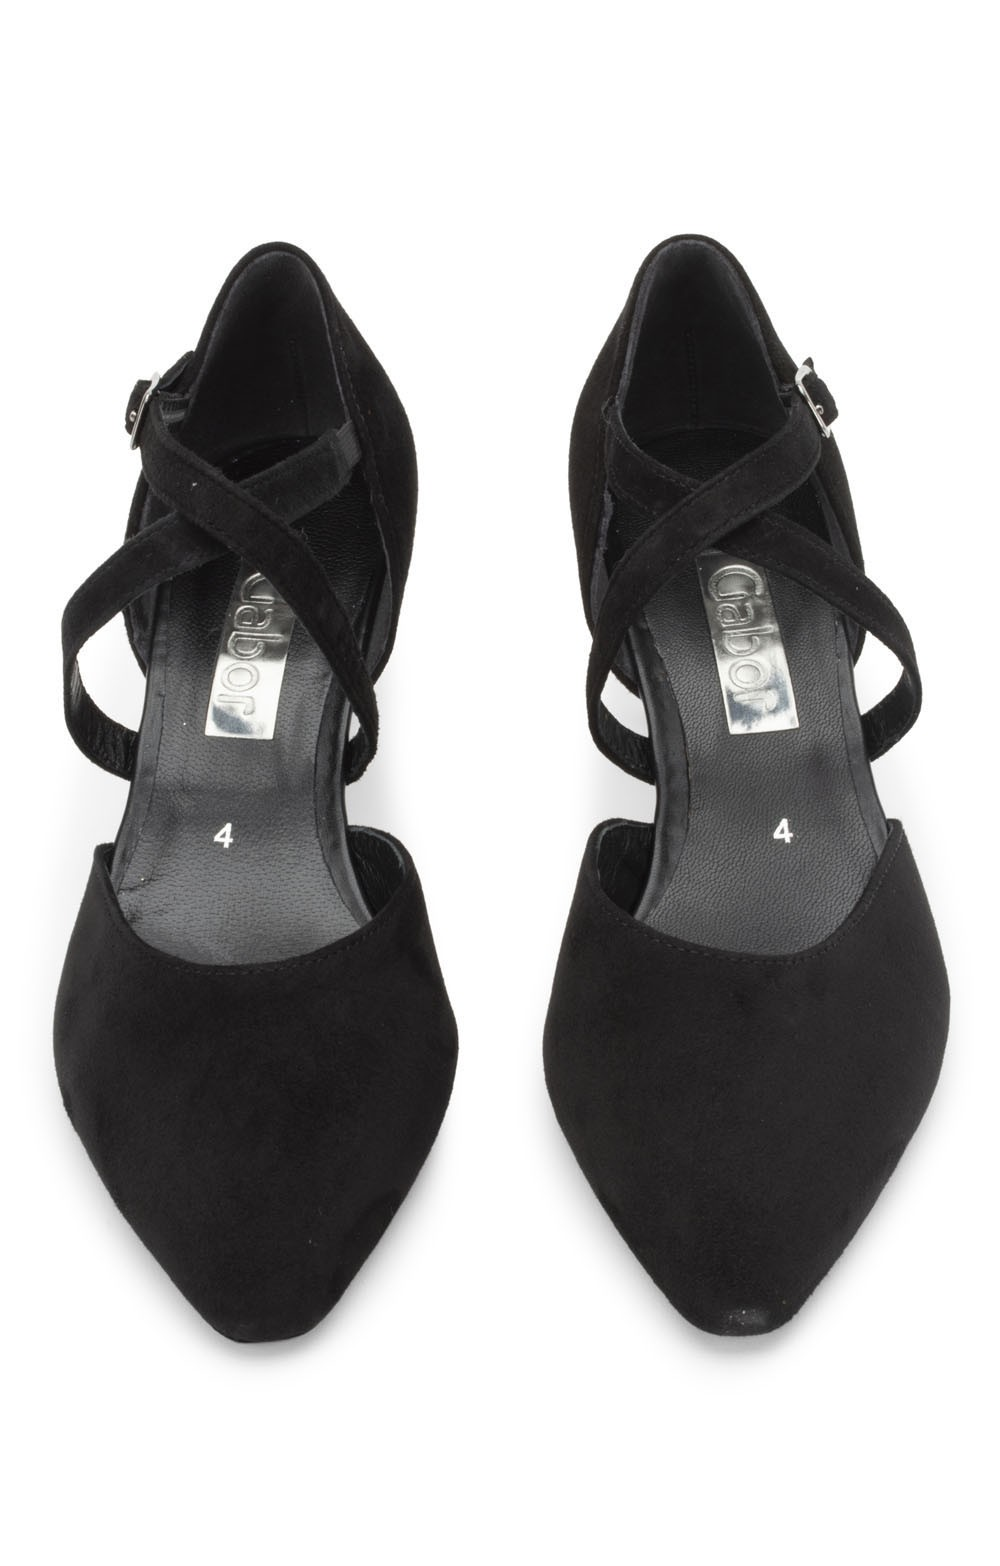 Ladies Gabor Strappy Mid Heel Sandal